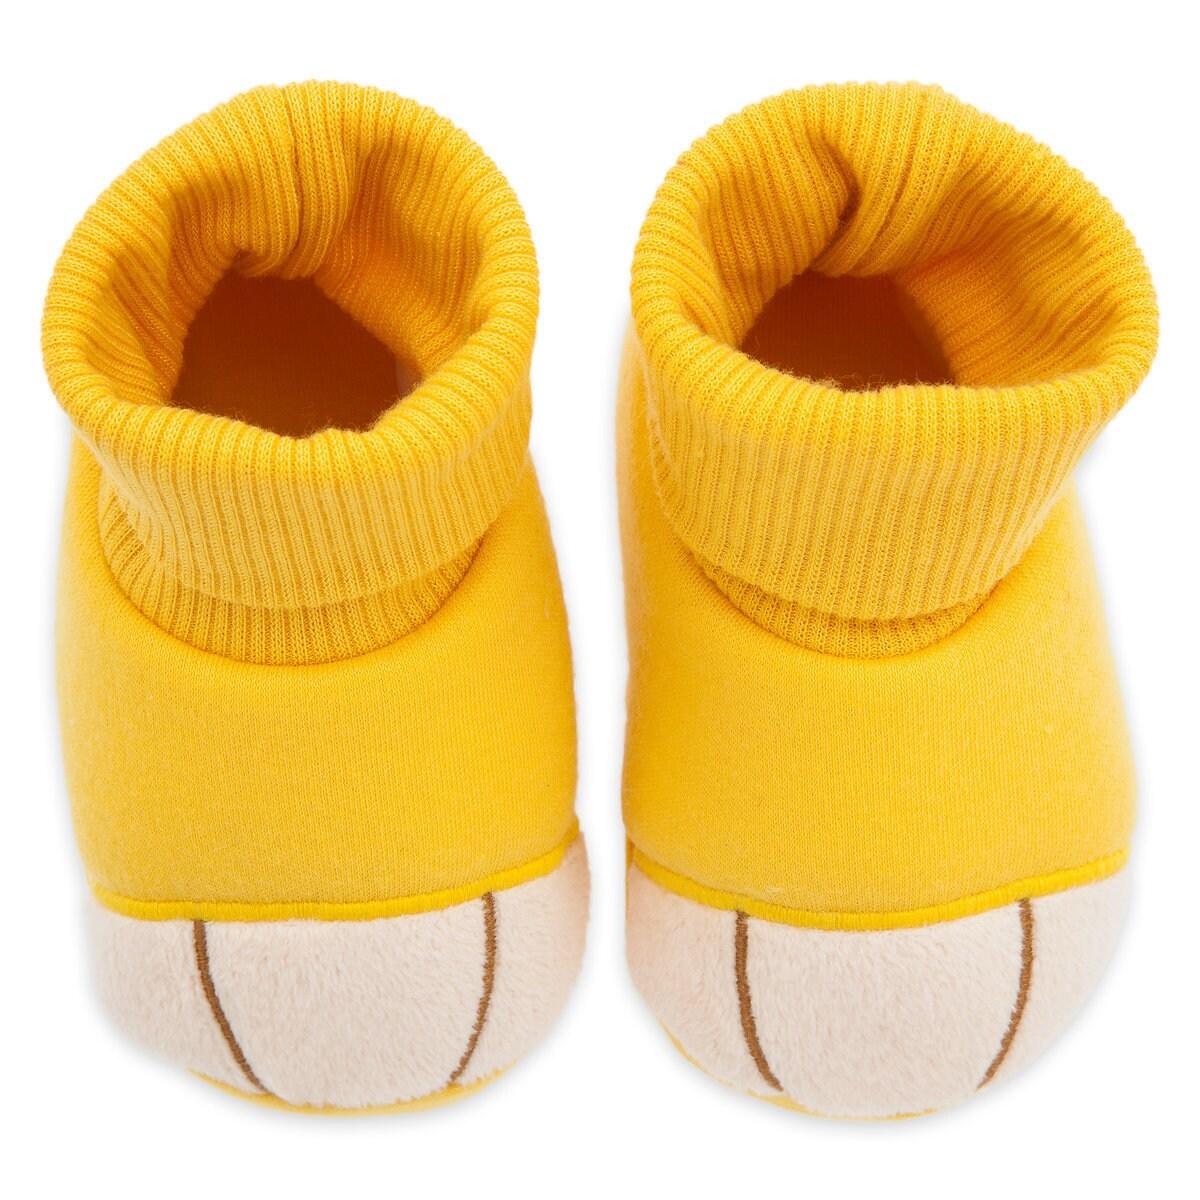 4eb2b71678edd Simba Costume Shoes for Baby | shopDisney